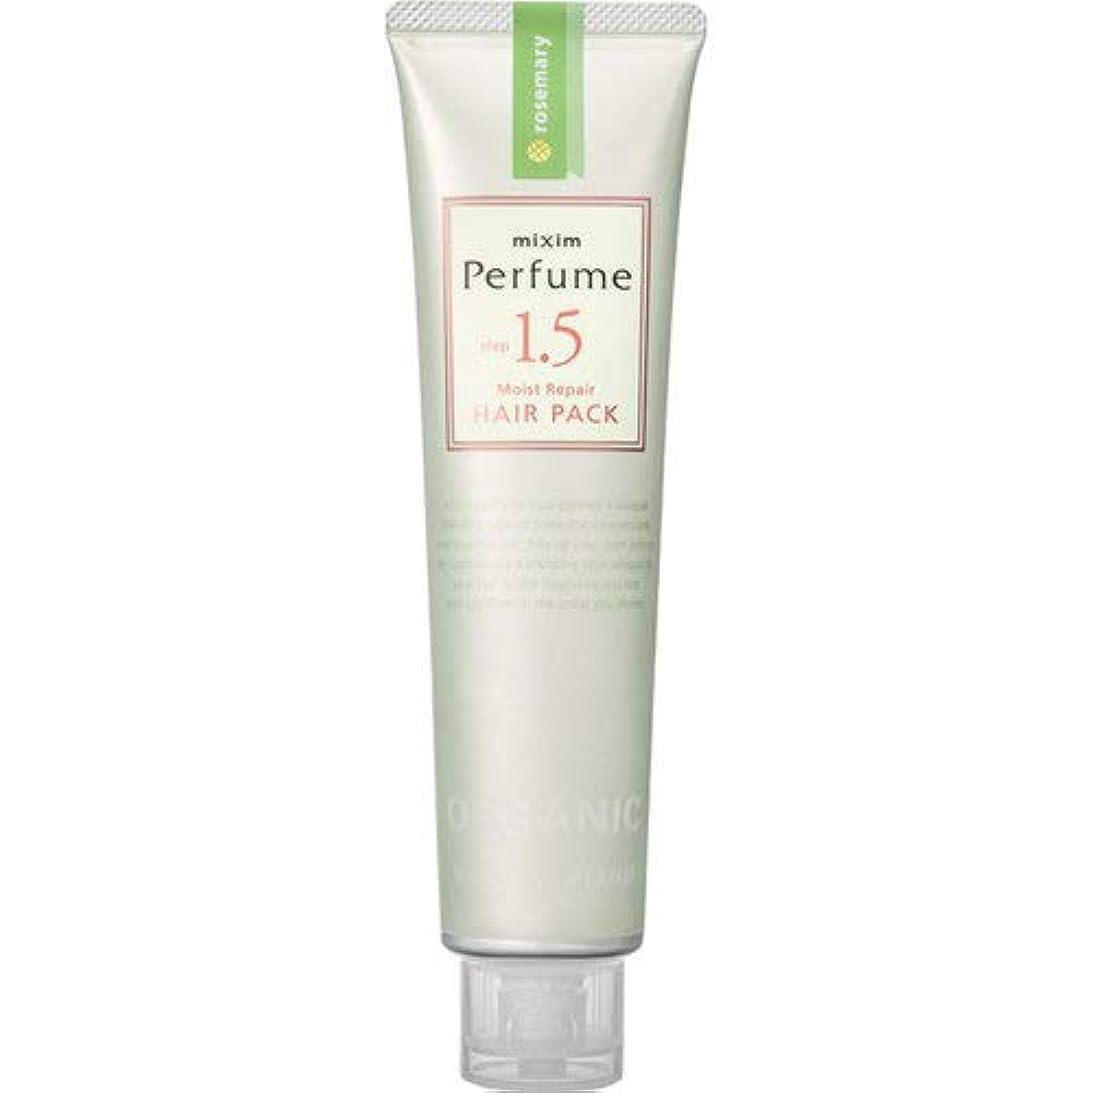 mixim Perfume(ミクシムパフューム) モイストリペア ヘアパック 130g